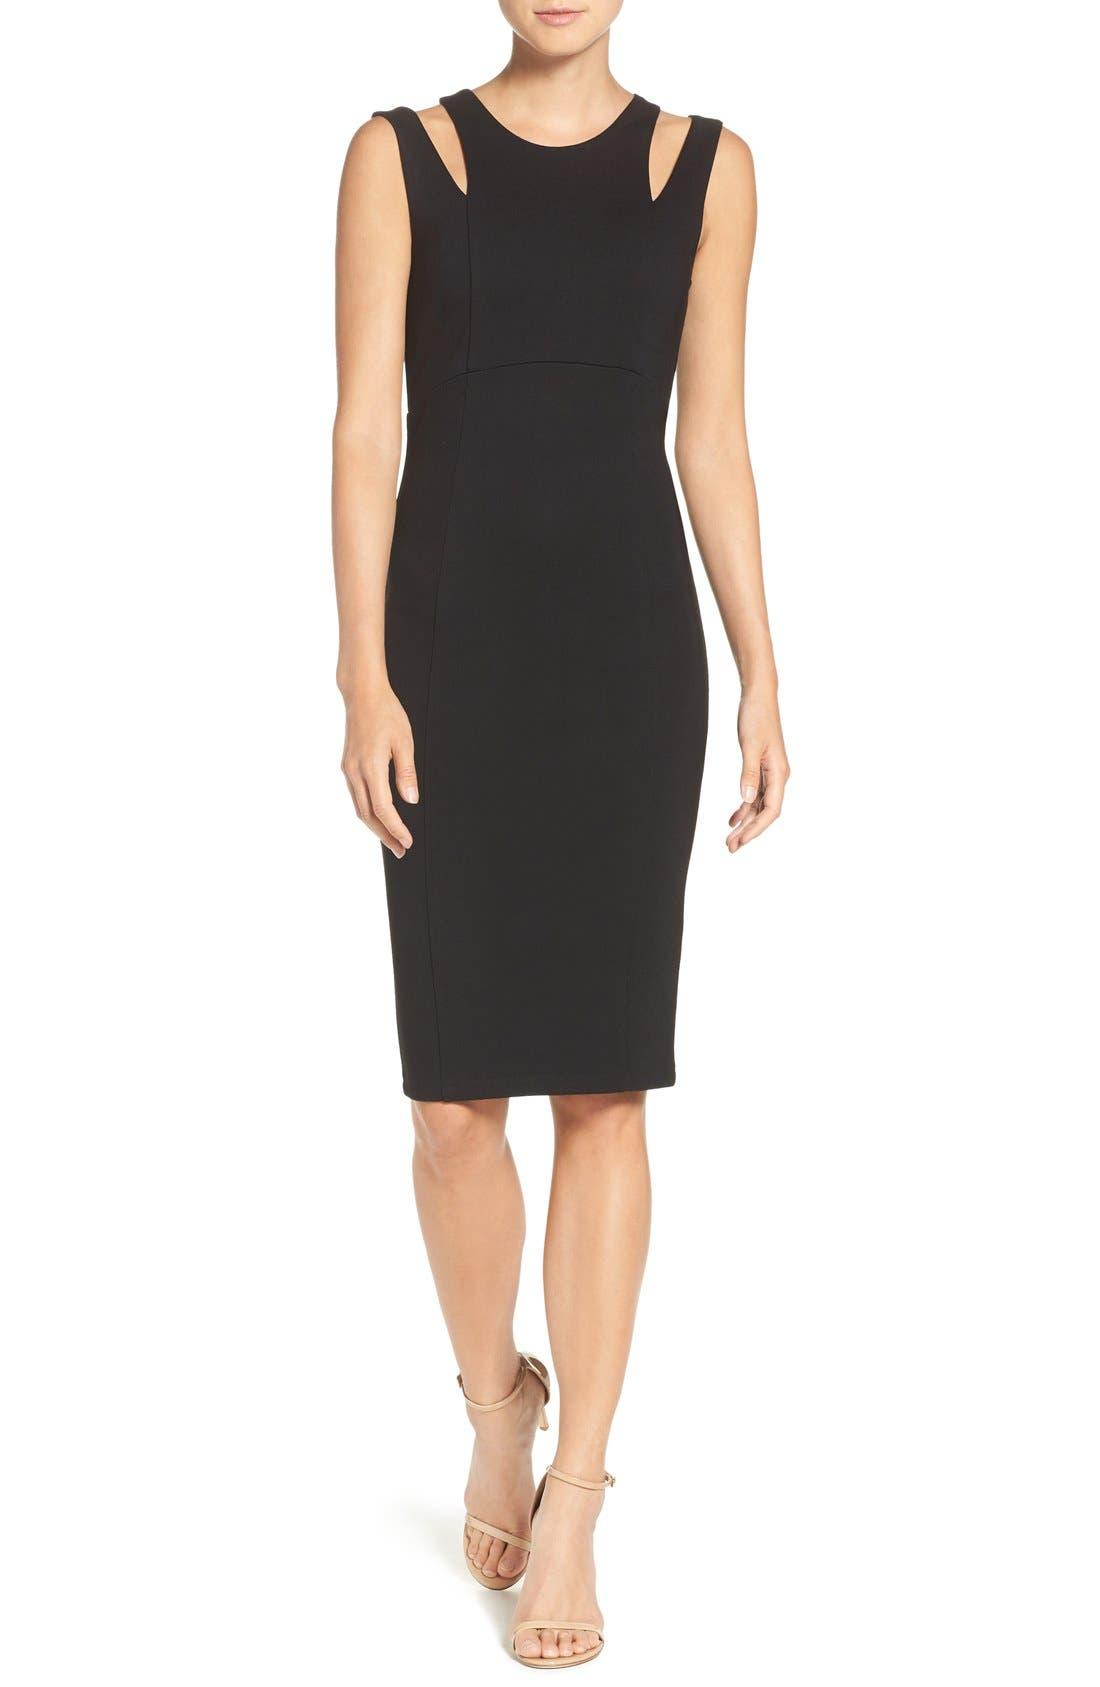 FELICITY & COCO Shoulder Detail Ponte Sheath Dress, Main, color, 001